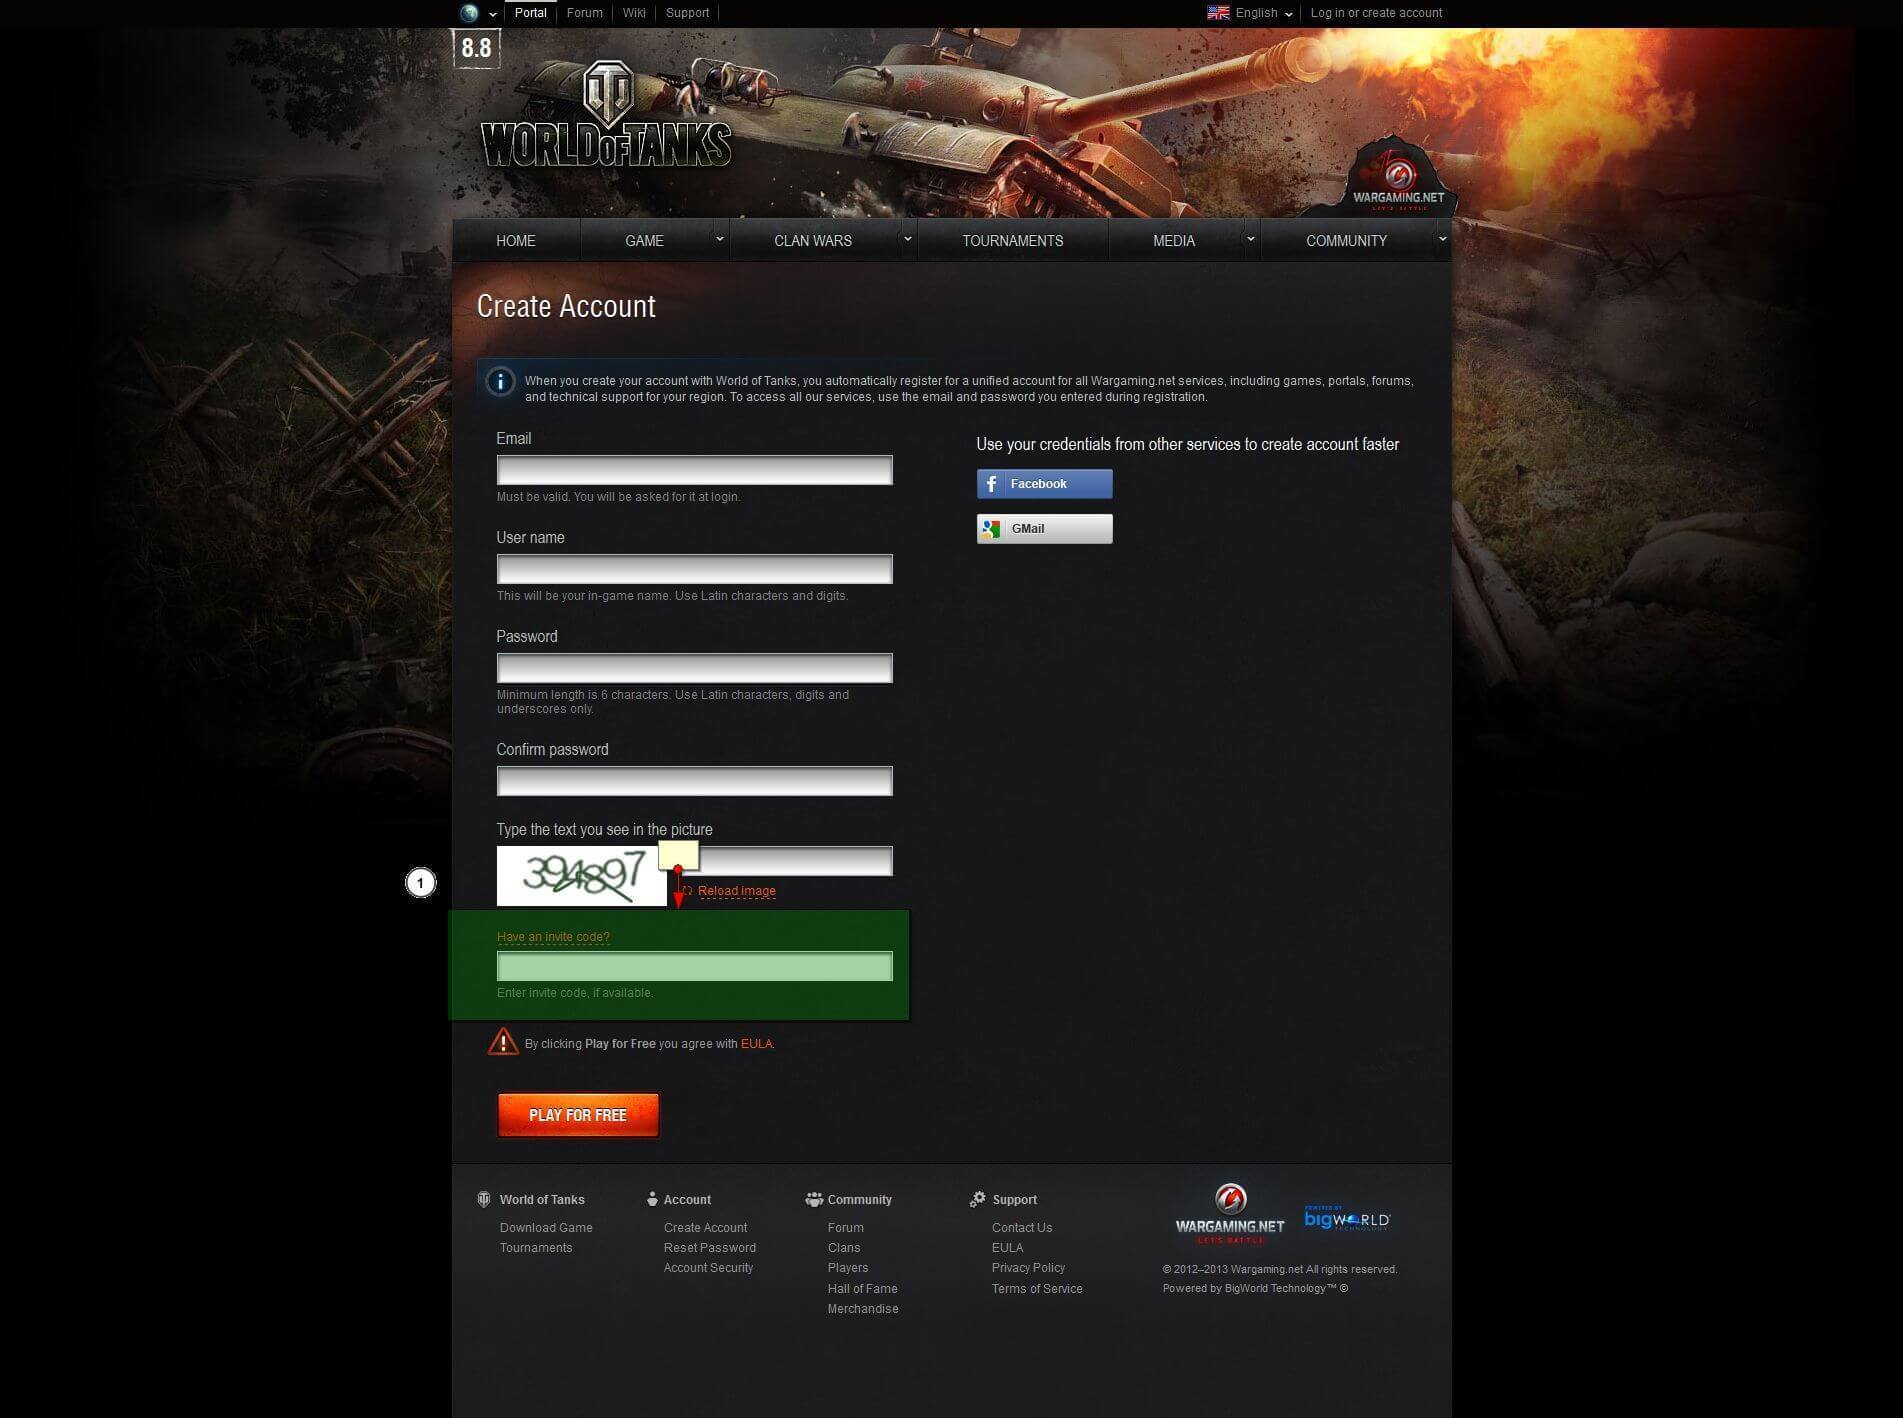 How do I use the bonusinvite code that I got World of Tanks